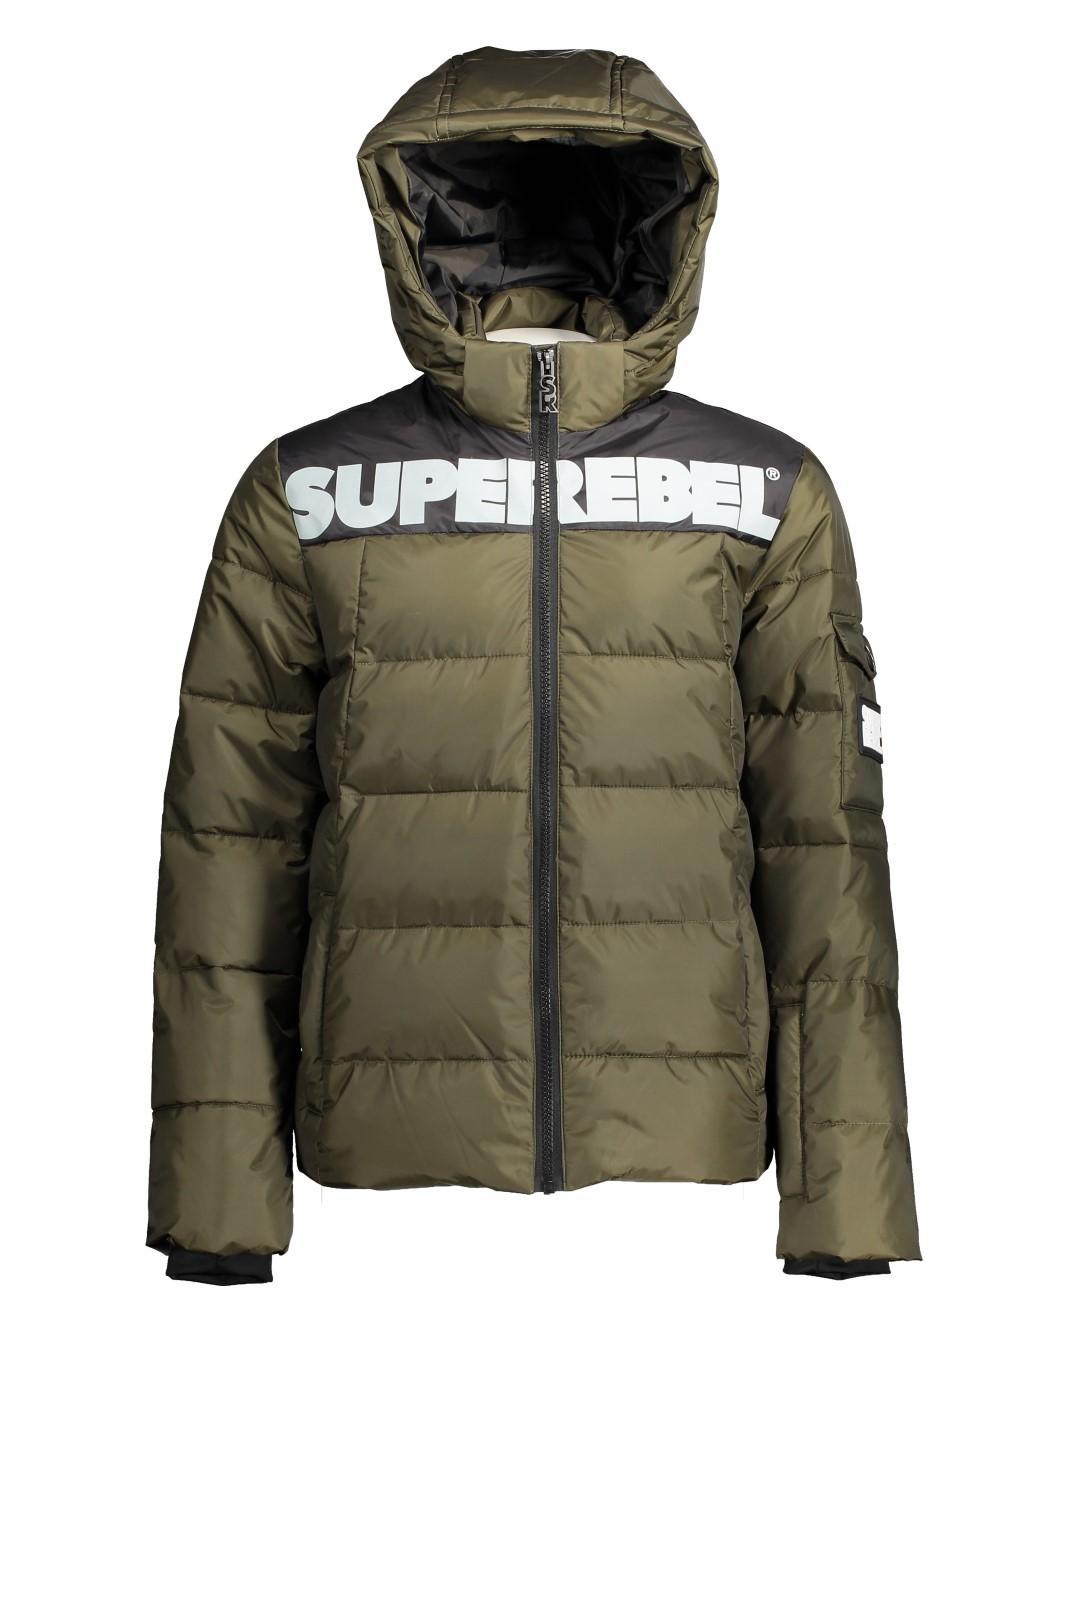 Superrebel Boys Stung Jacket 2022